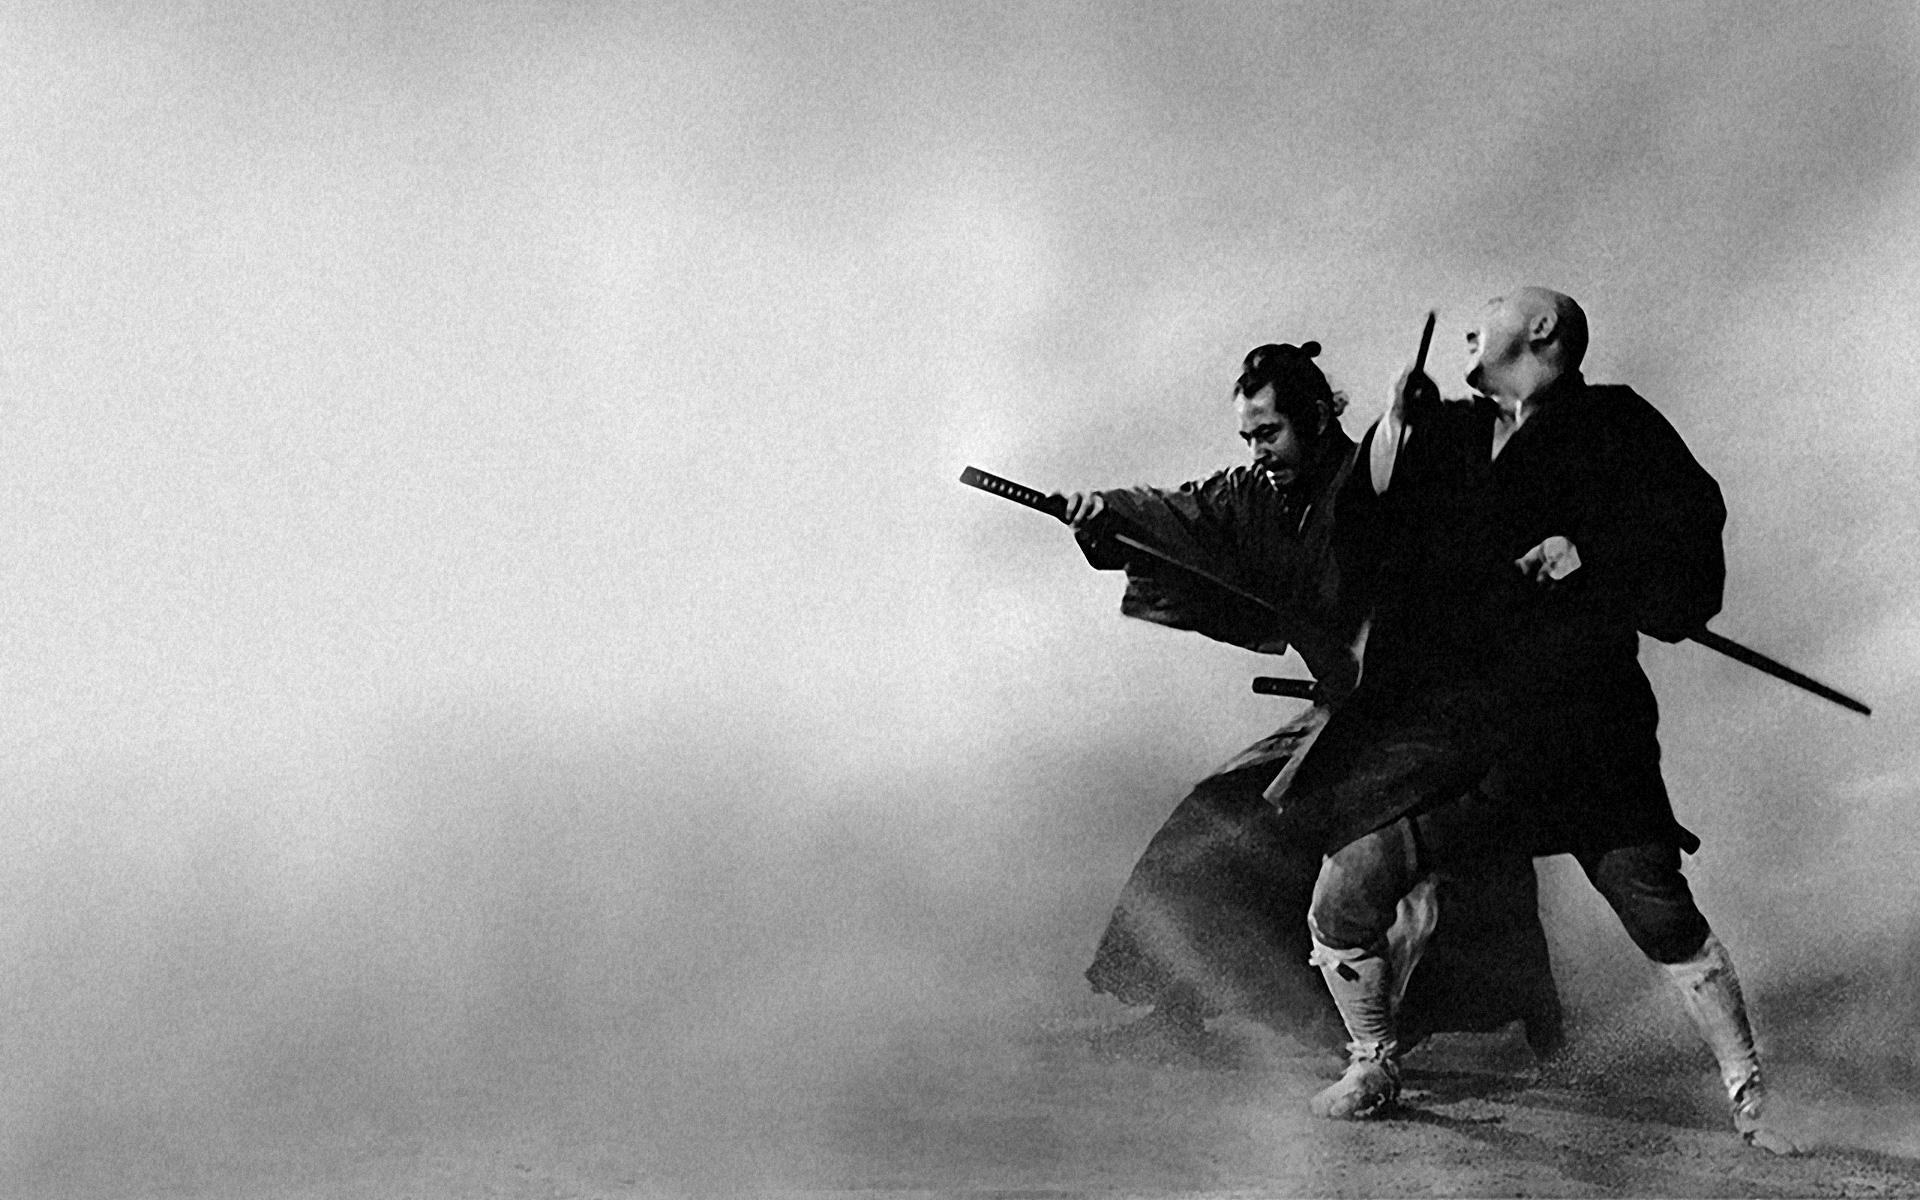 samurai_fog_swordsman_toshiro_mifune_desktop_1920x1200_wallpaper-417214.jpg (1920×1200)